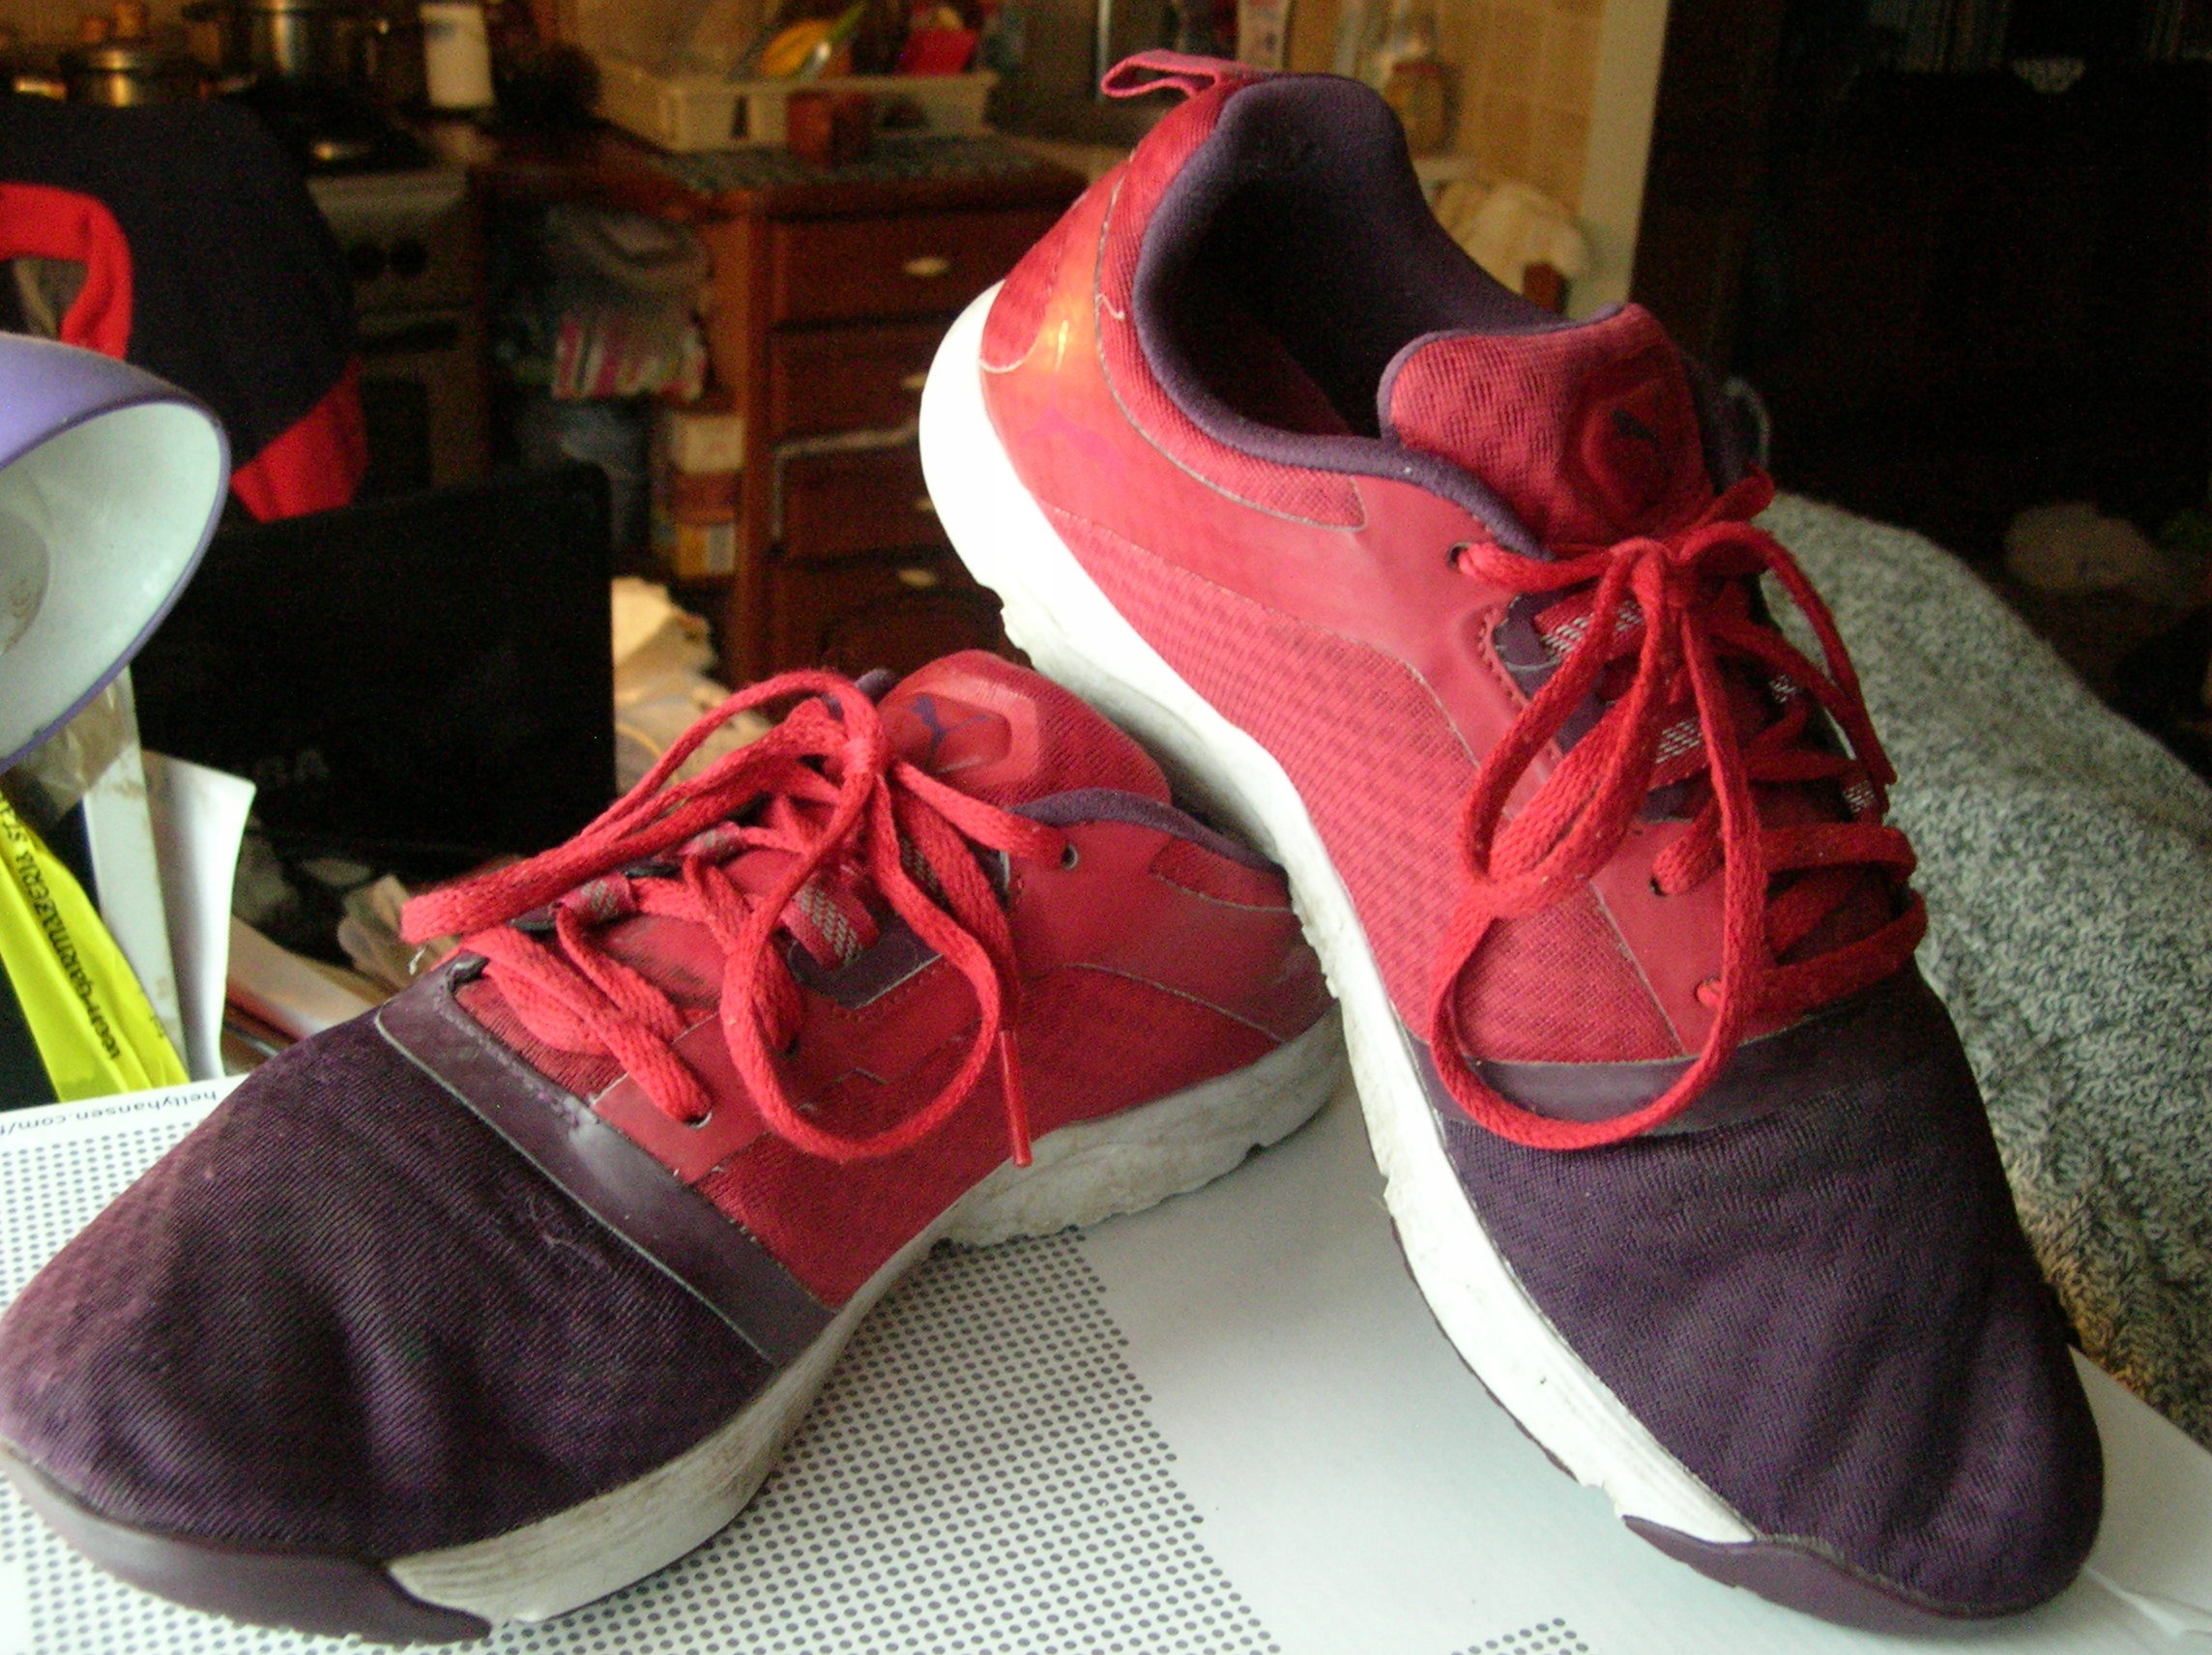 Adidasy PUMA buty sportowe jogging 40 jak nike